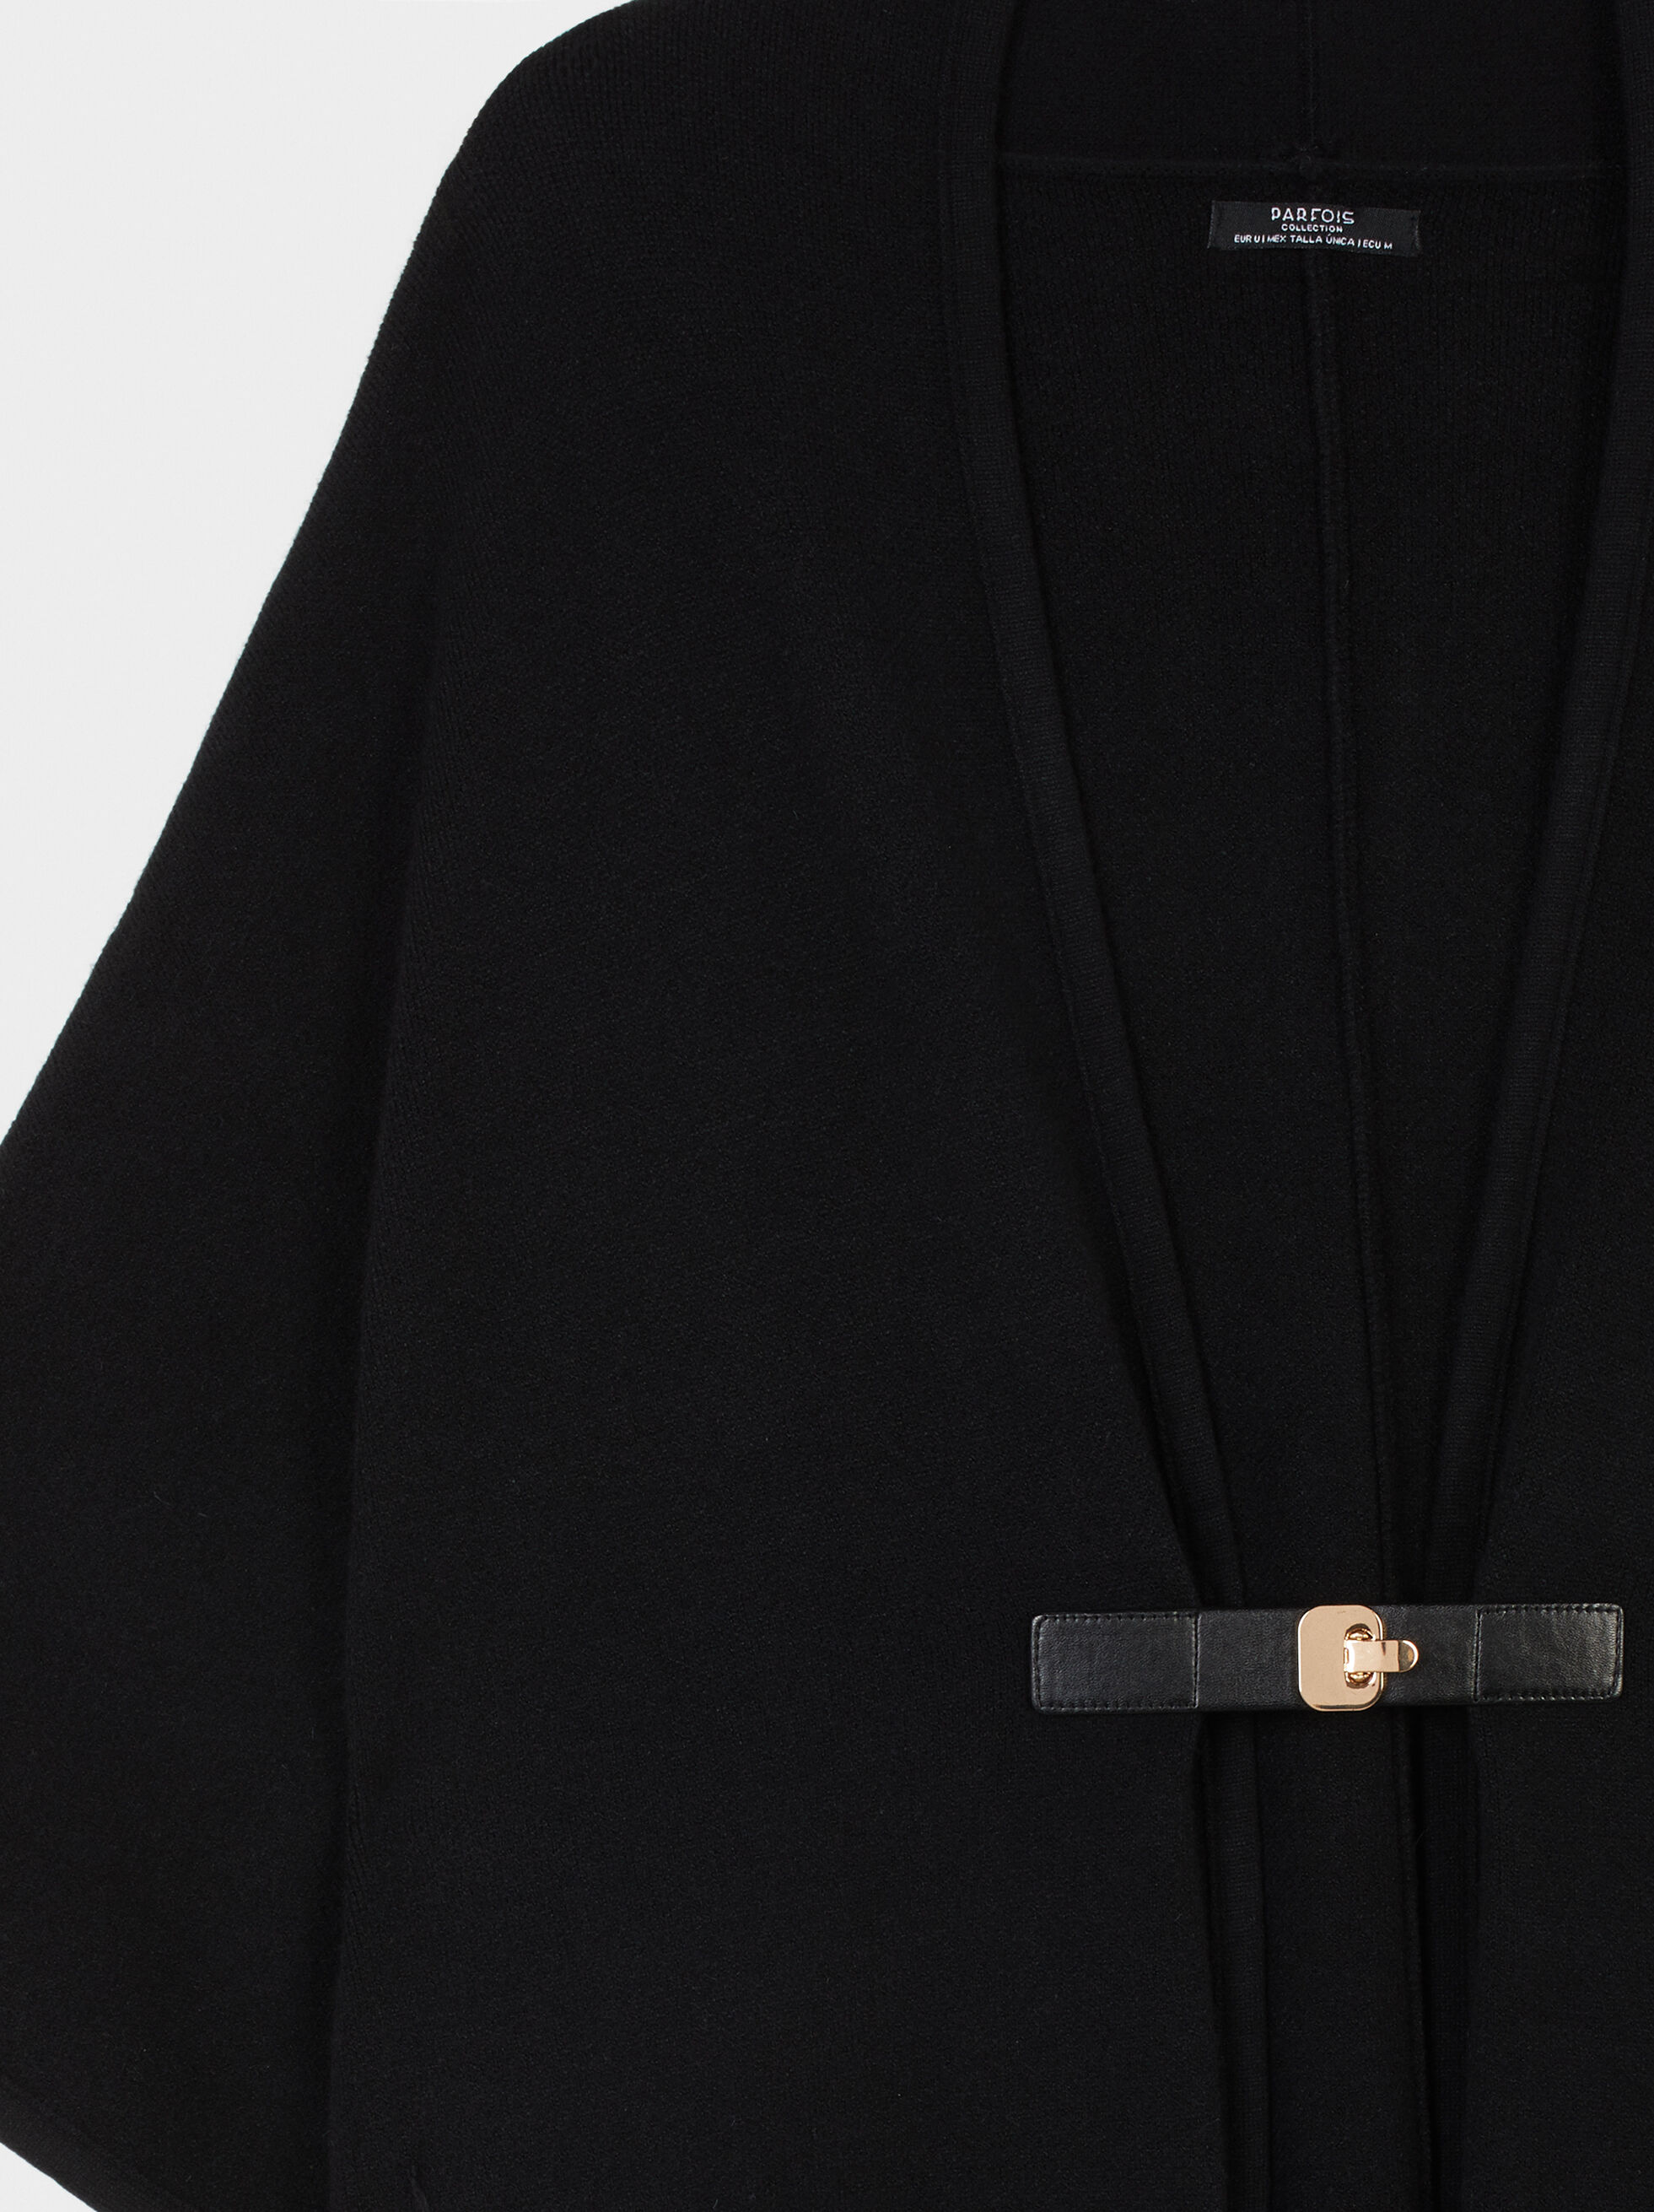 Poncho With Pockets, Black, hi-res